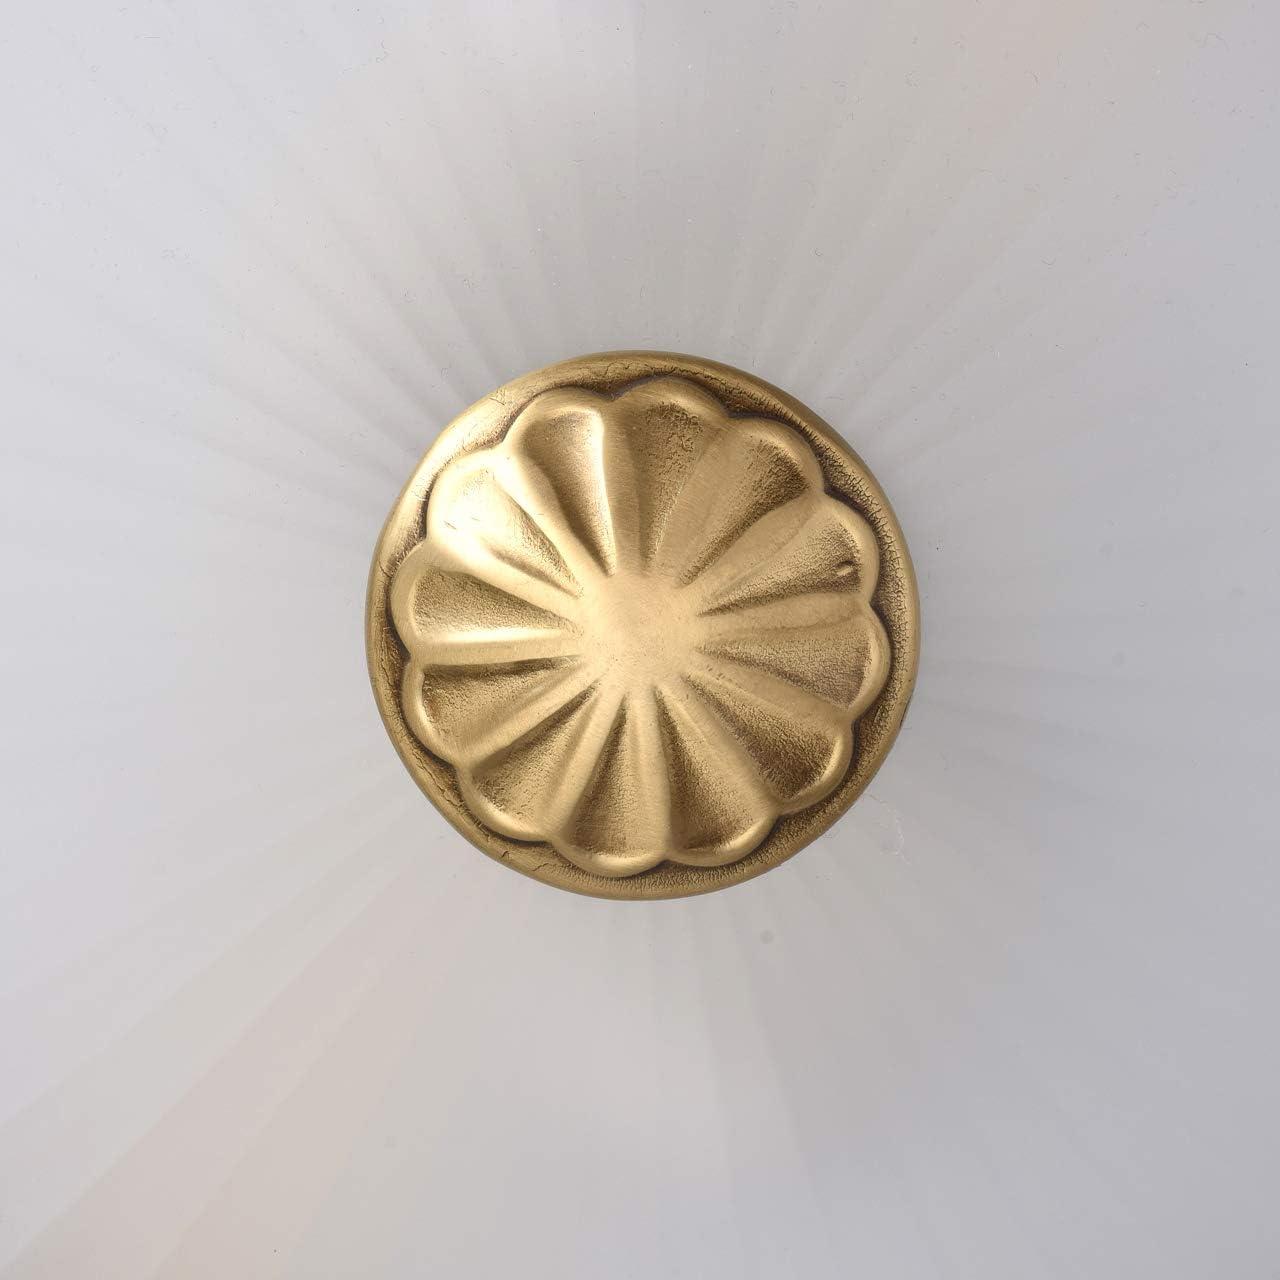 l/ámpara LED l/ámpara de techo para Sal/ón /& Comedor plaf/ón LED de LAMPENWELT Retro, Vintage 2 llamas, GU10, A+ LED L/ámpara de techo Leonor en Bronce hecho de Metal e.o